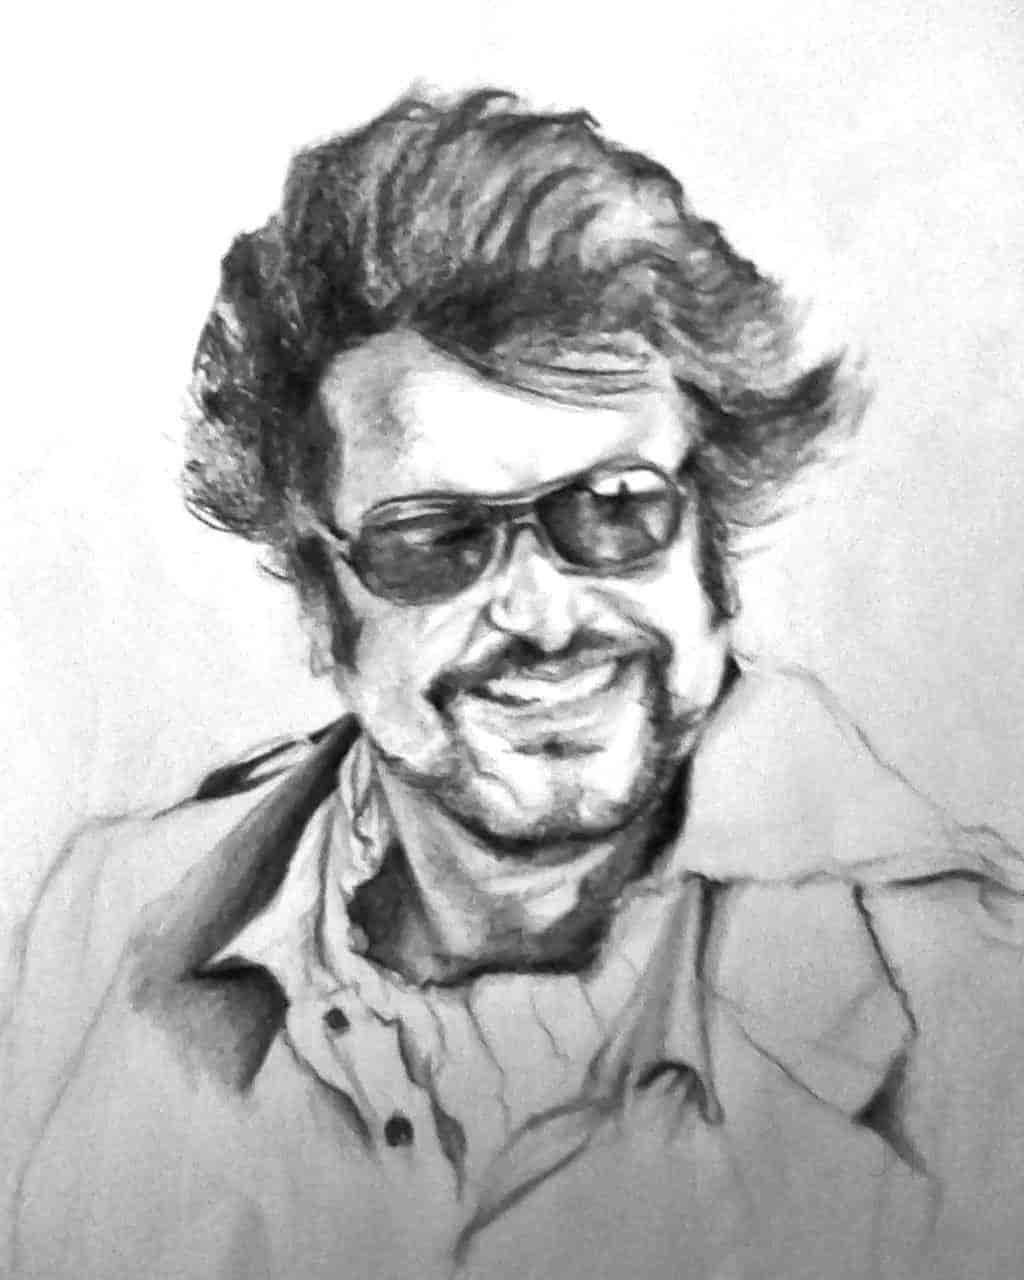 Best arts triplicane drawing job work in chennai justdial